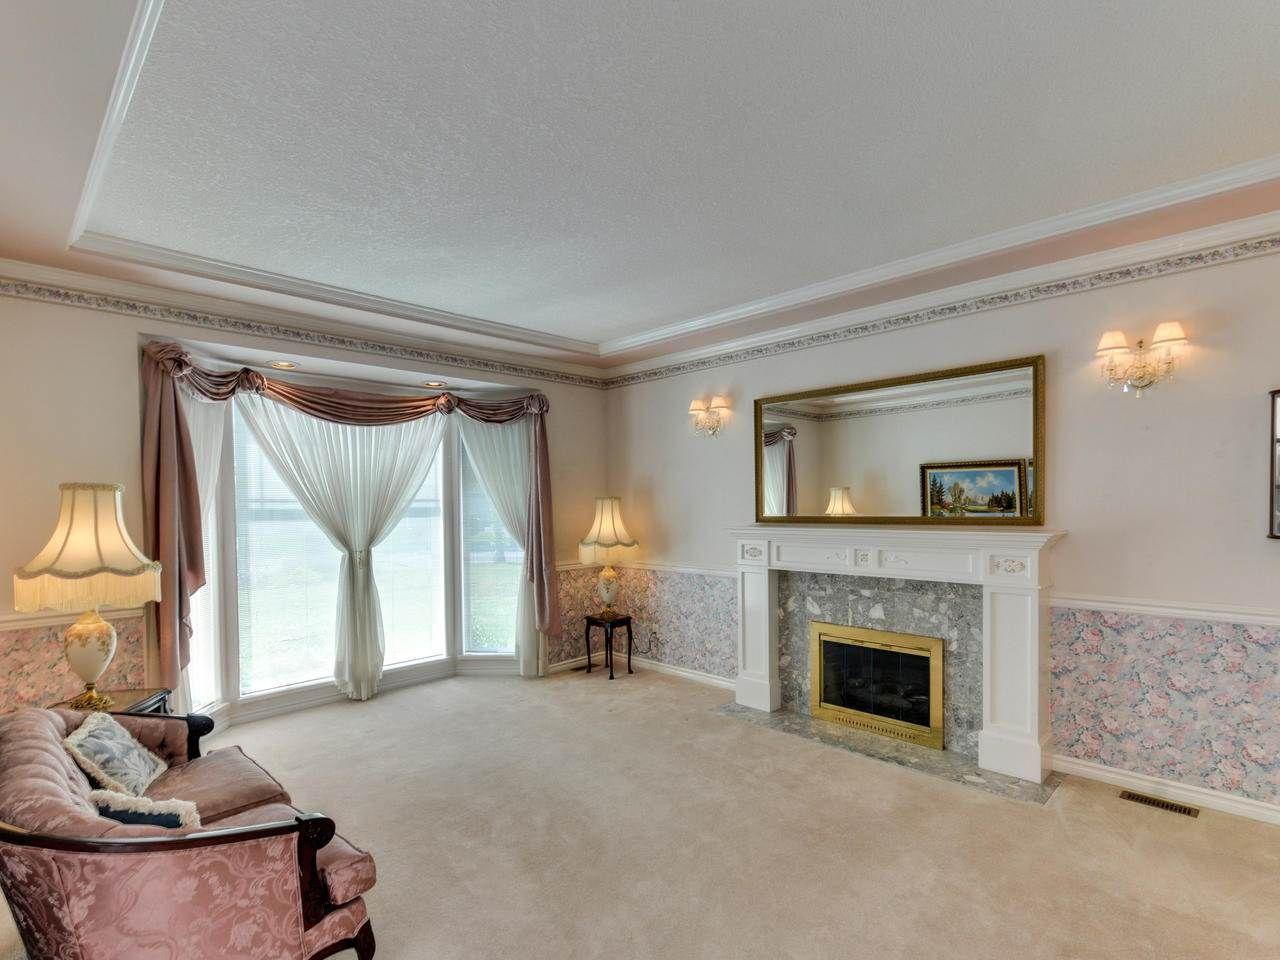 "Photo 3: Photos: 14923 24A Avenue in Surrey: Sunnyside Park Surrey House for sale in ""Sherborrke Estates"" (South Surrey White Rock)  : MLS®# R2374300"